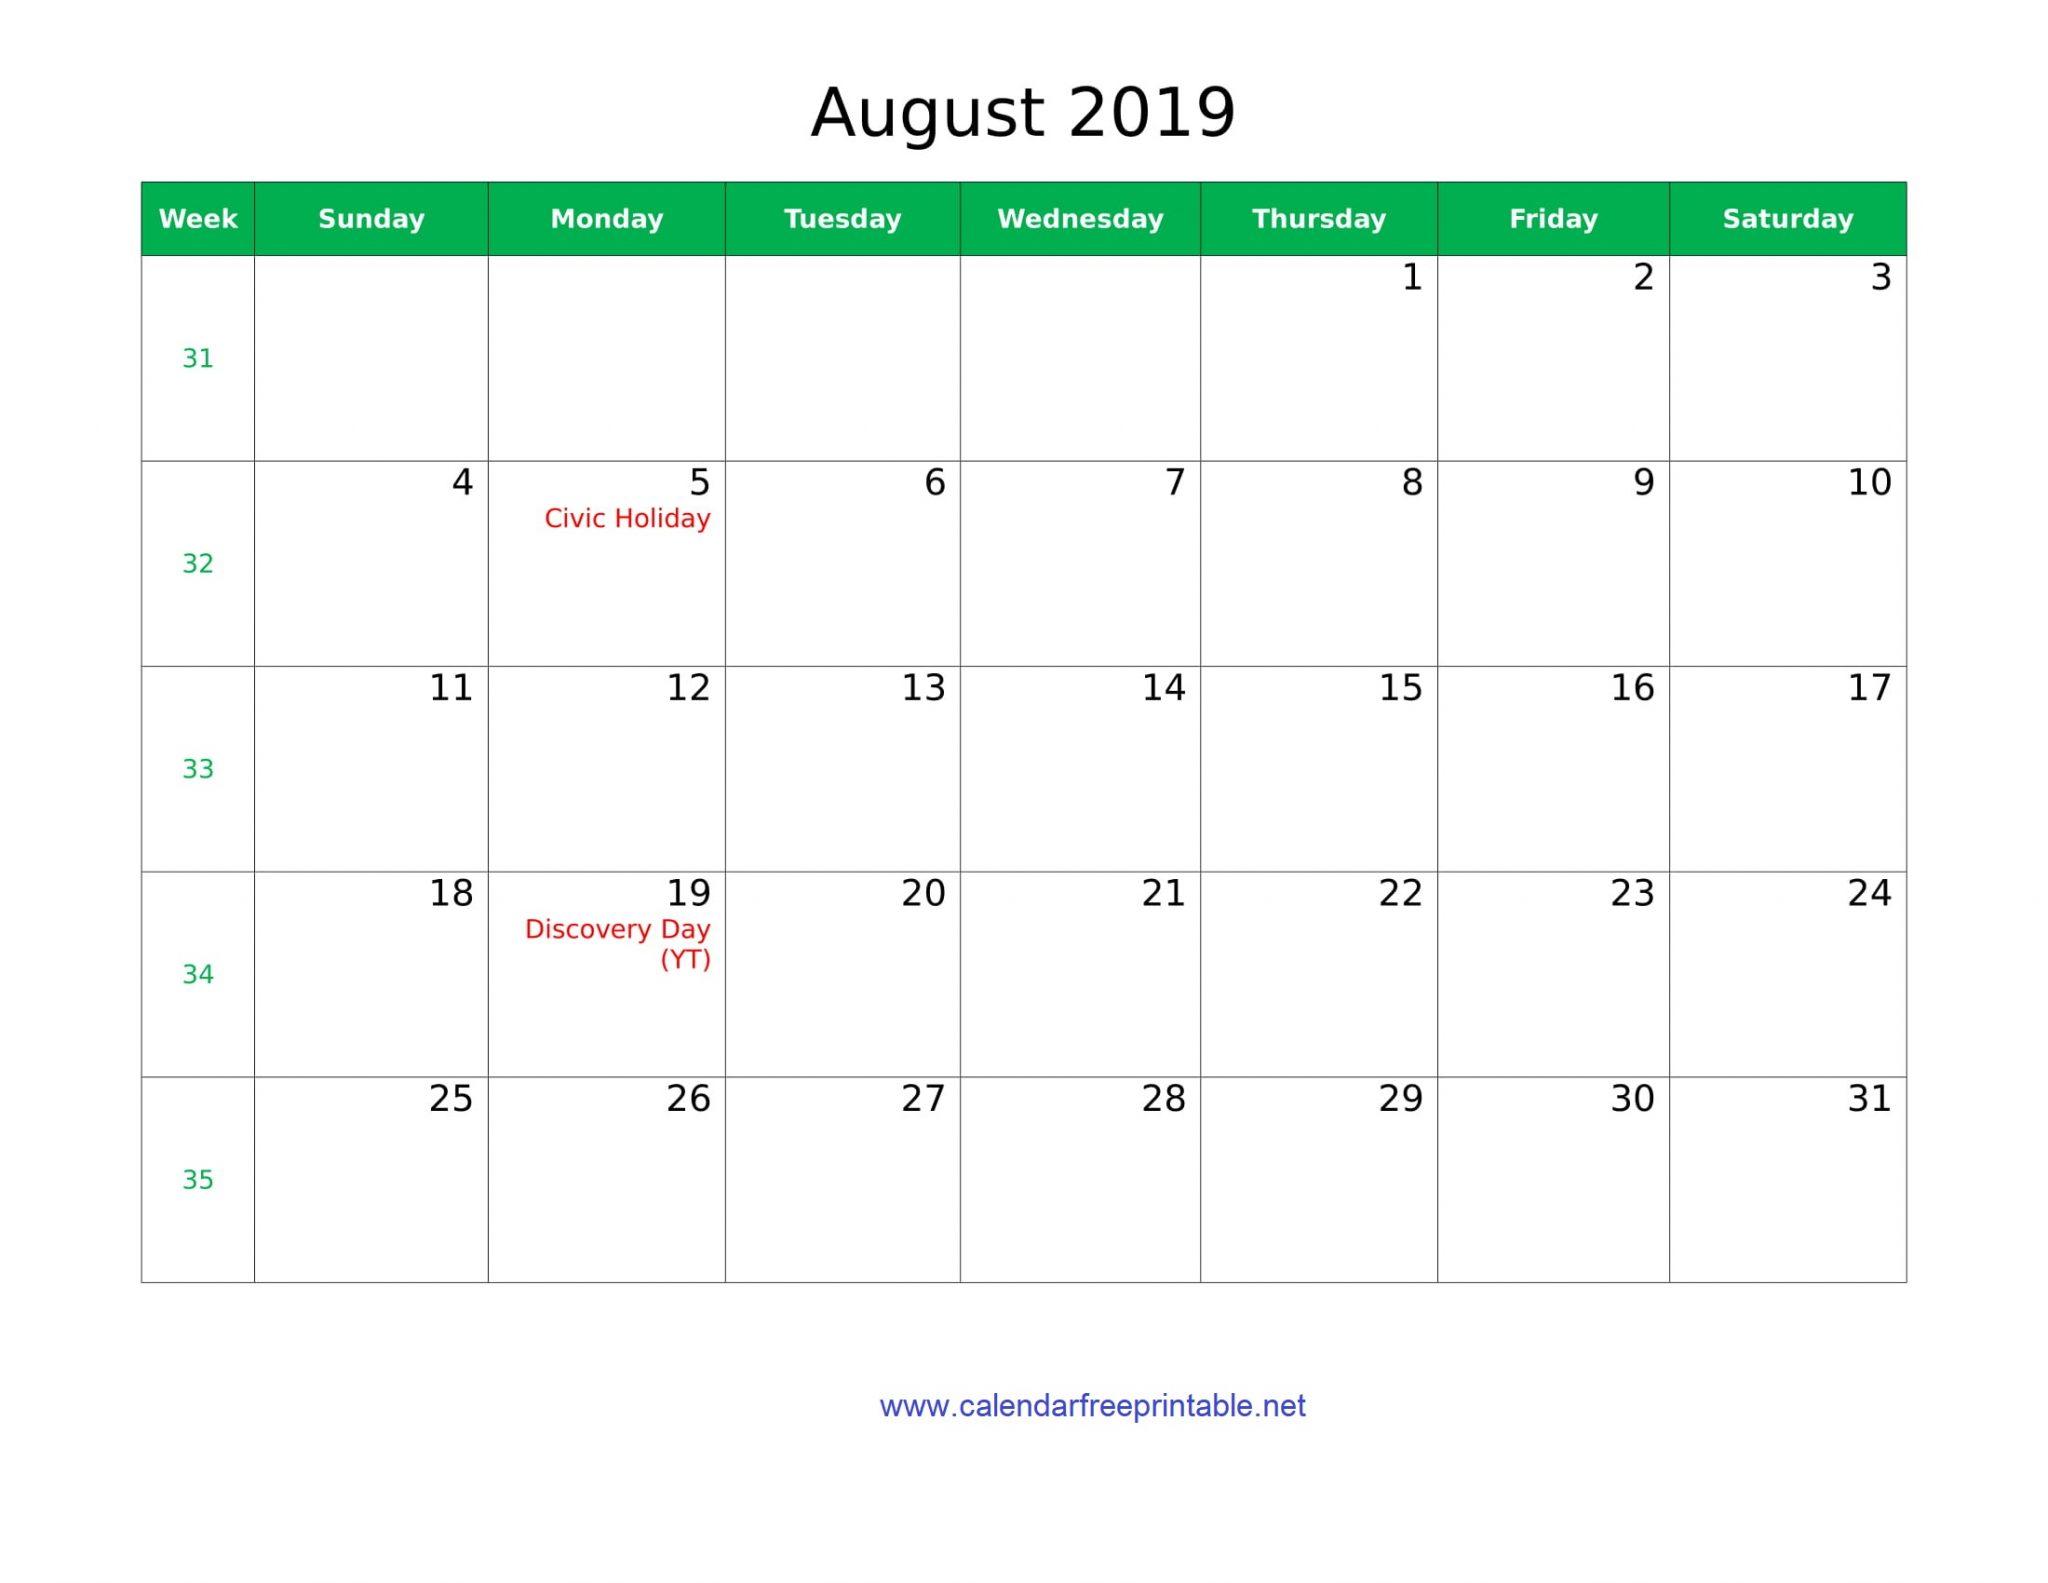 August 2019 Holidays Calendar - Free Printable Calendar, Templates with regard to August Calendar Template Printable